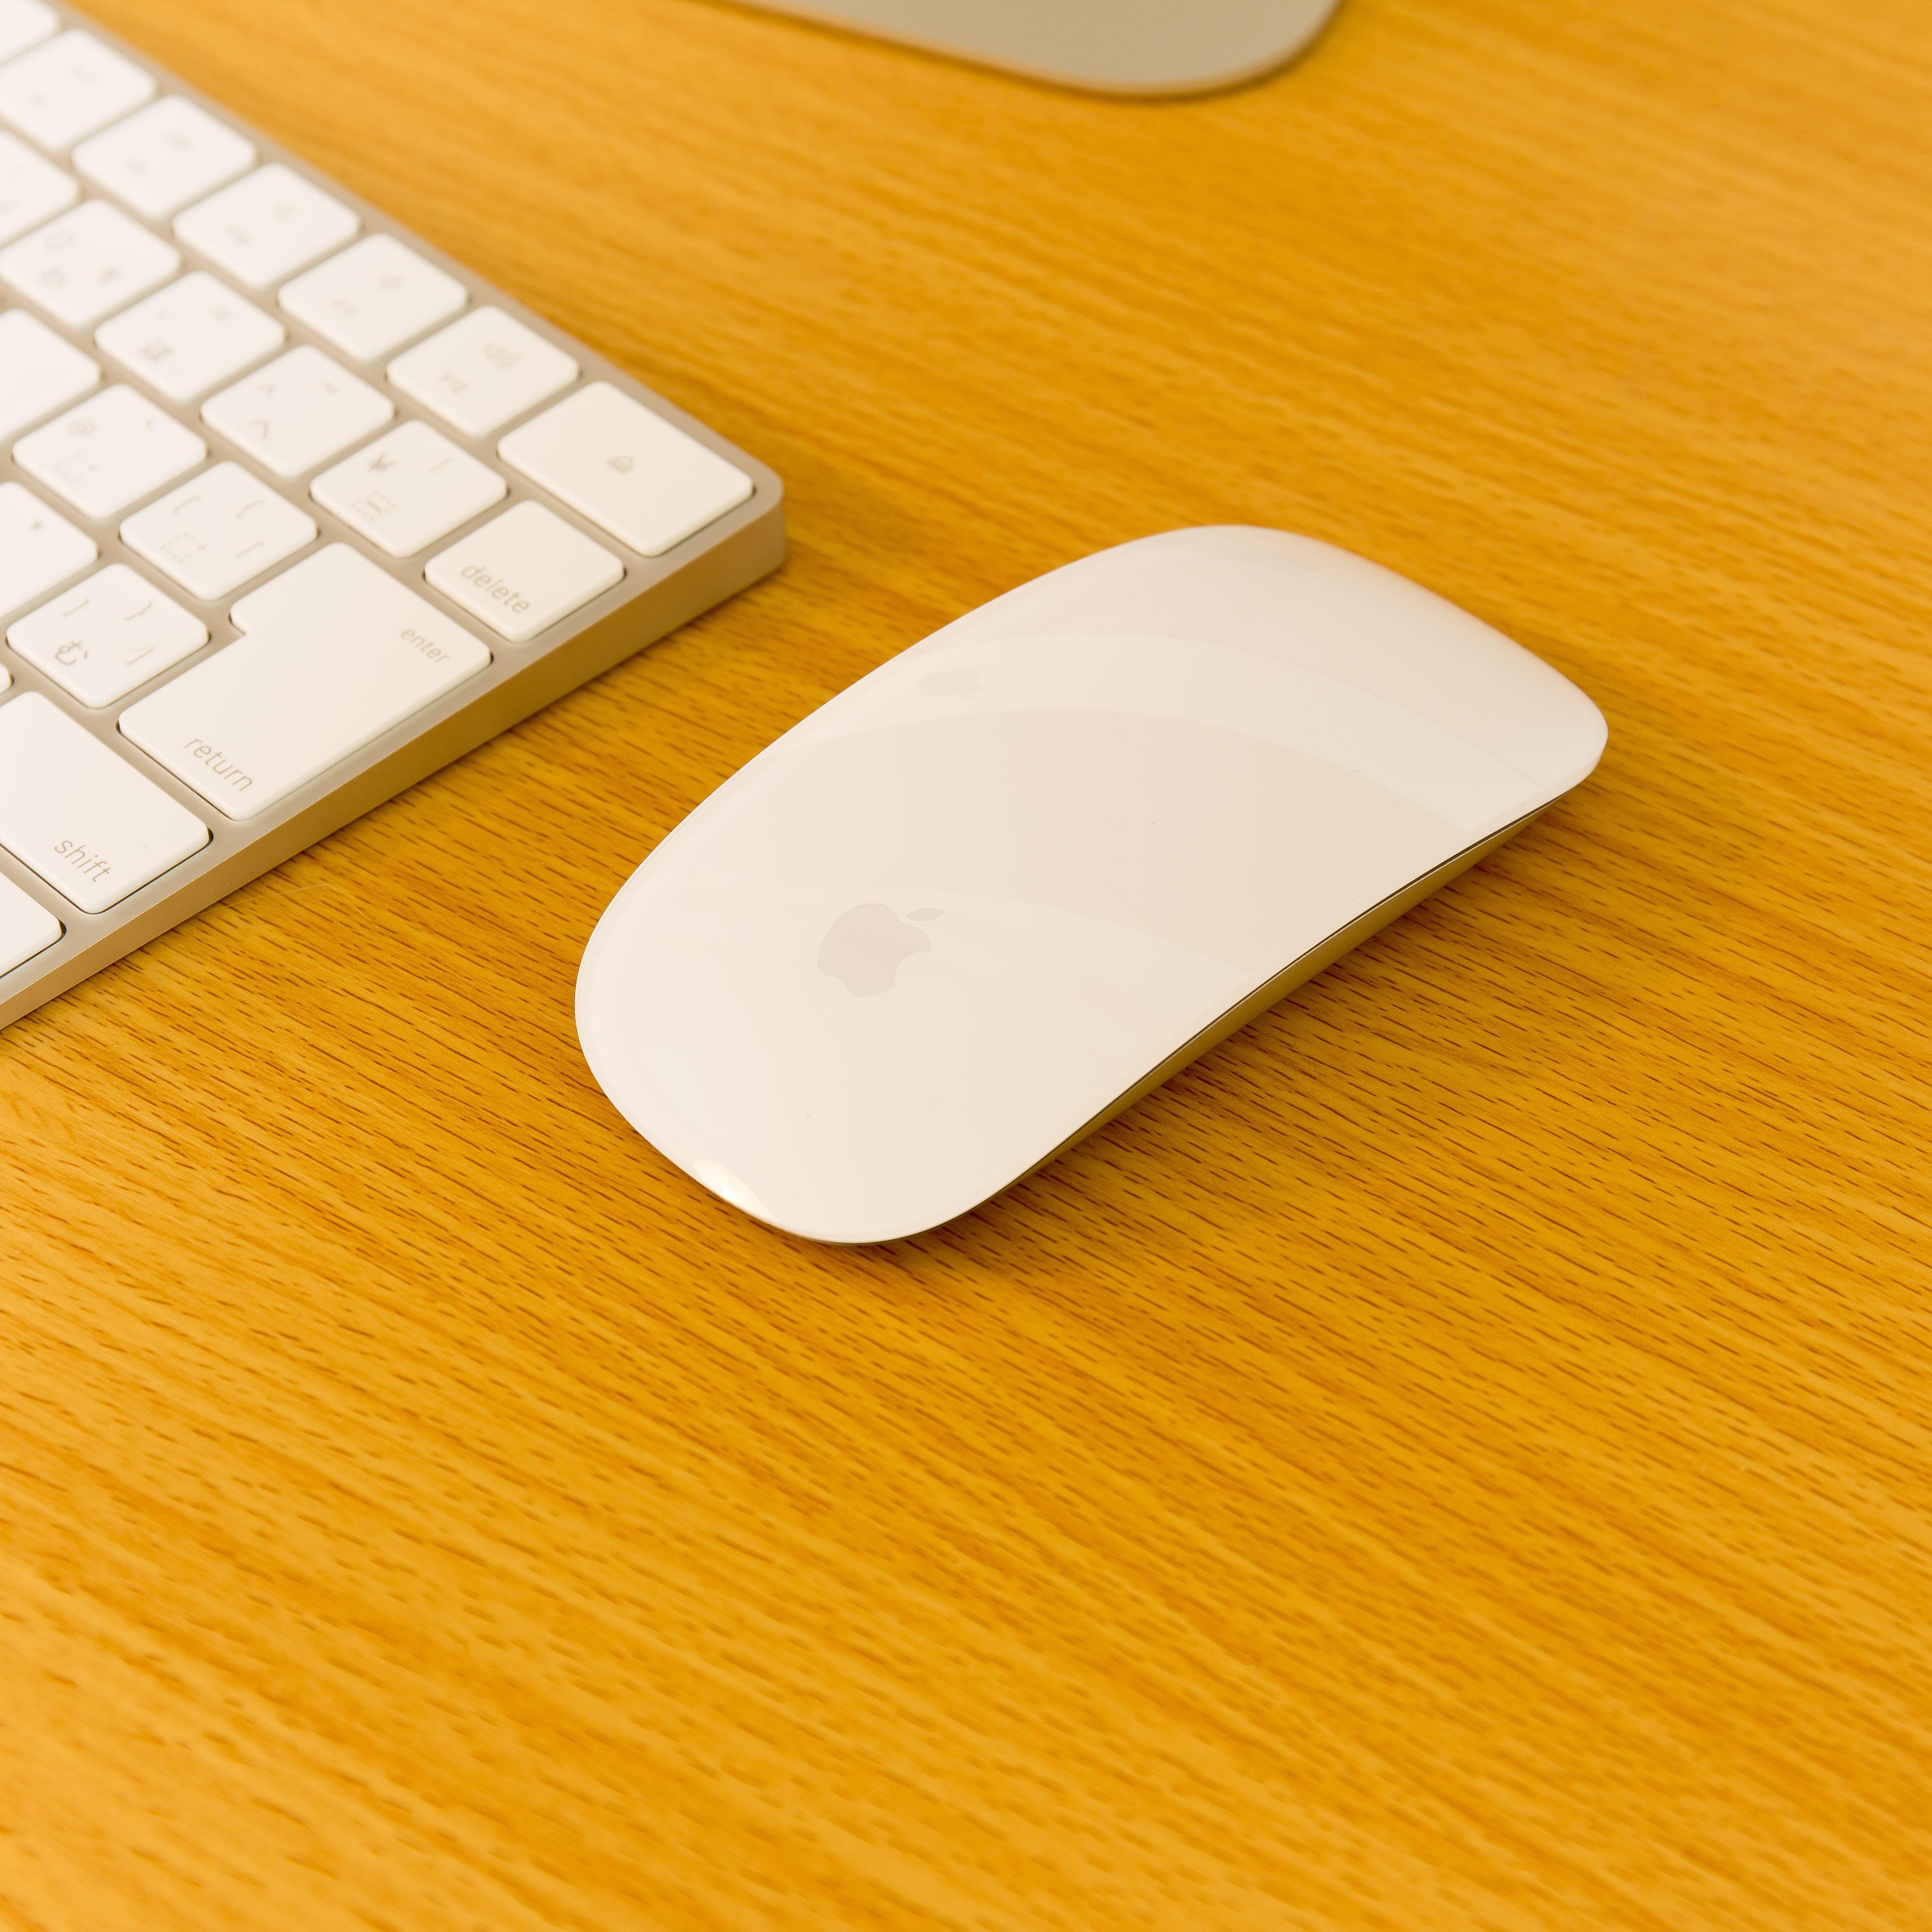 「iMac Retina 21.5インチ」購入(9)